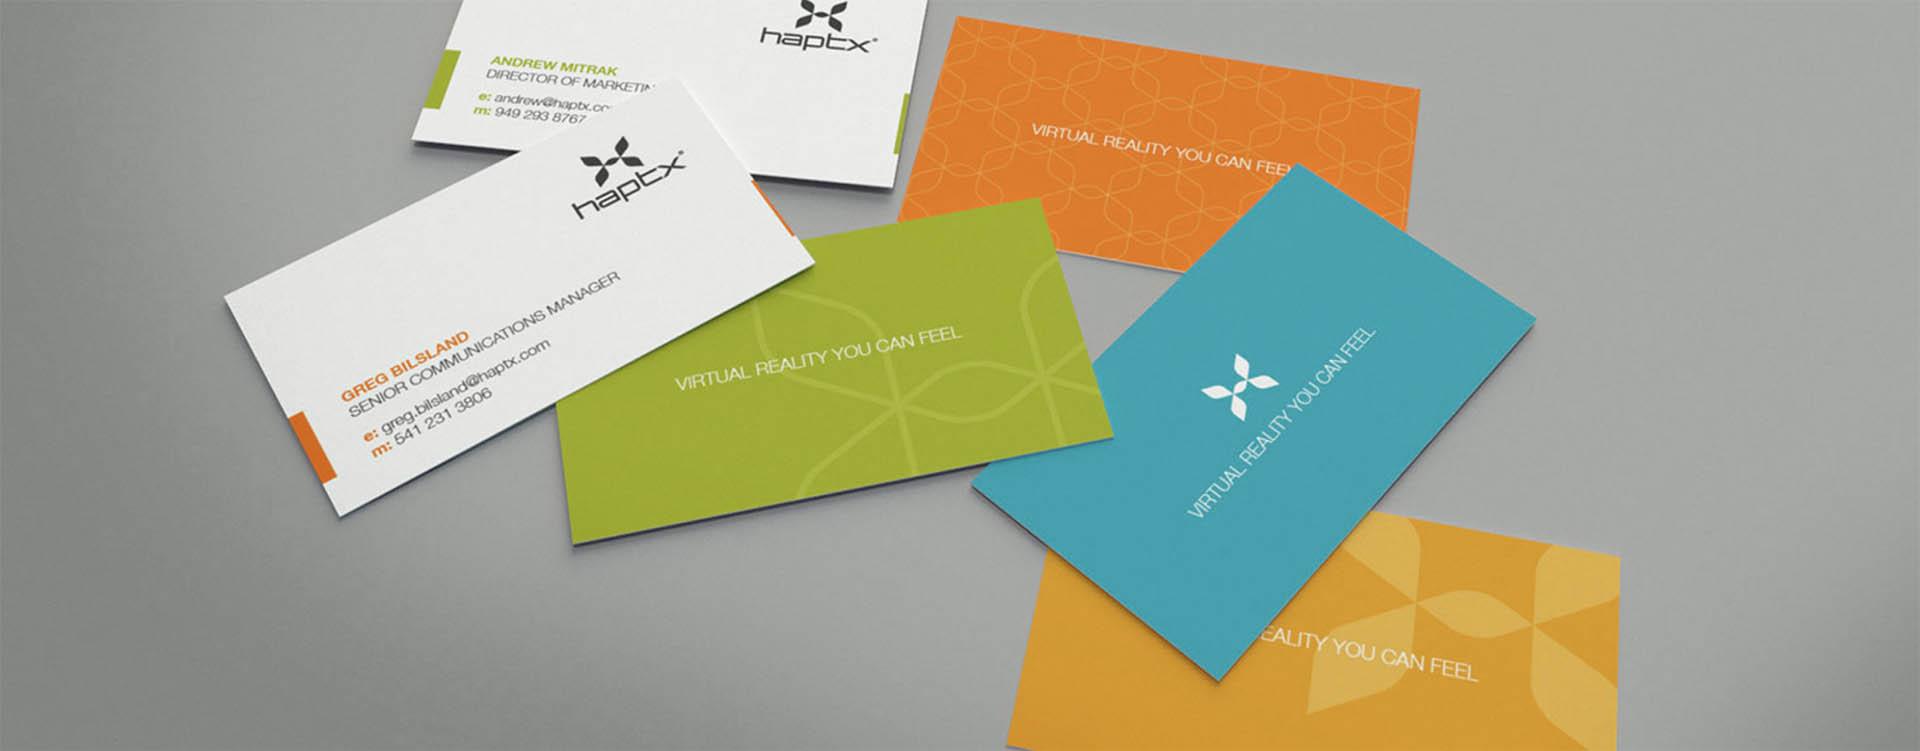 Rotator-HaptX-Biz-Cards.jpg